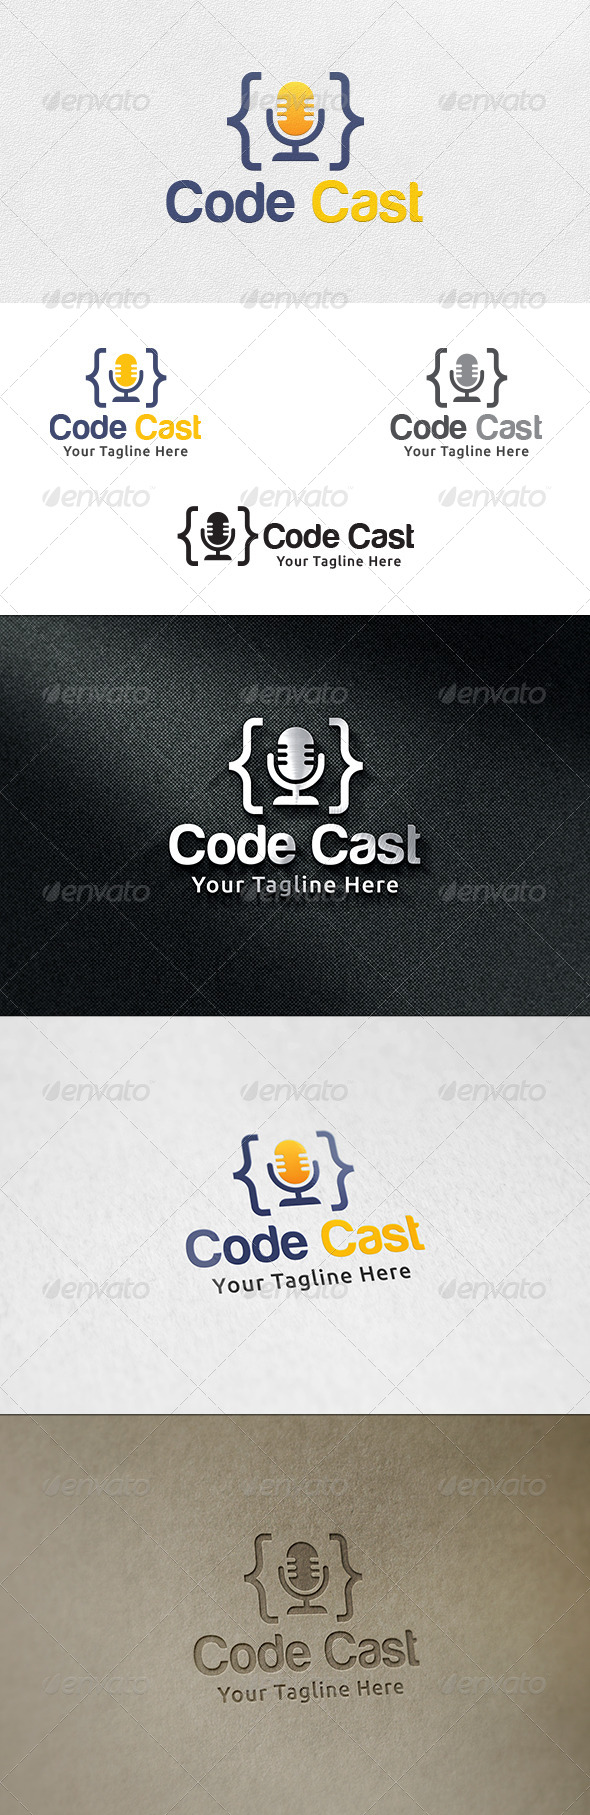 Code Cast - Logo Template